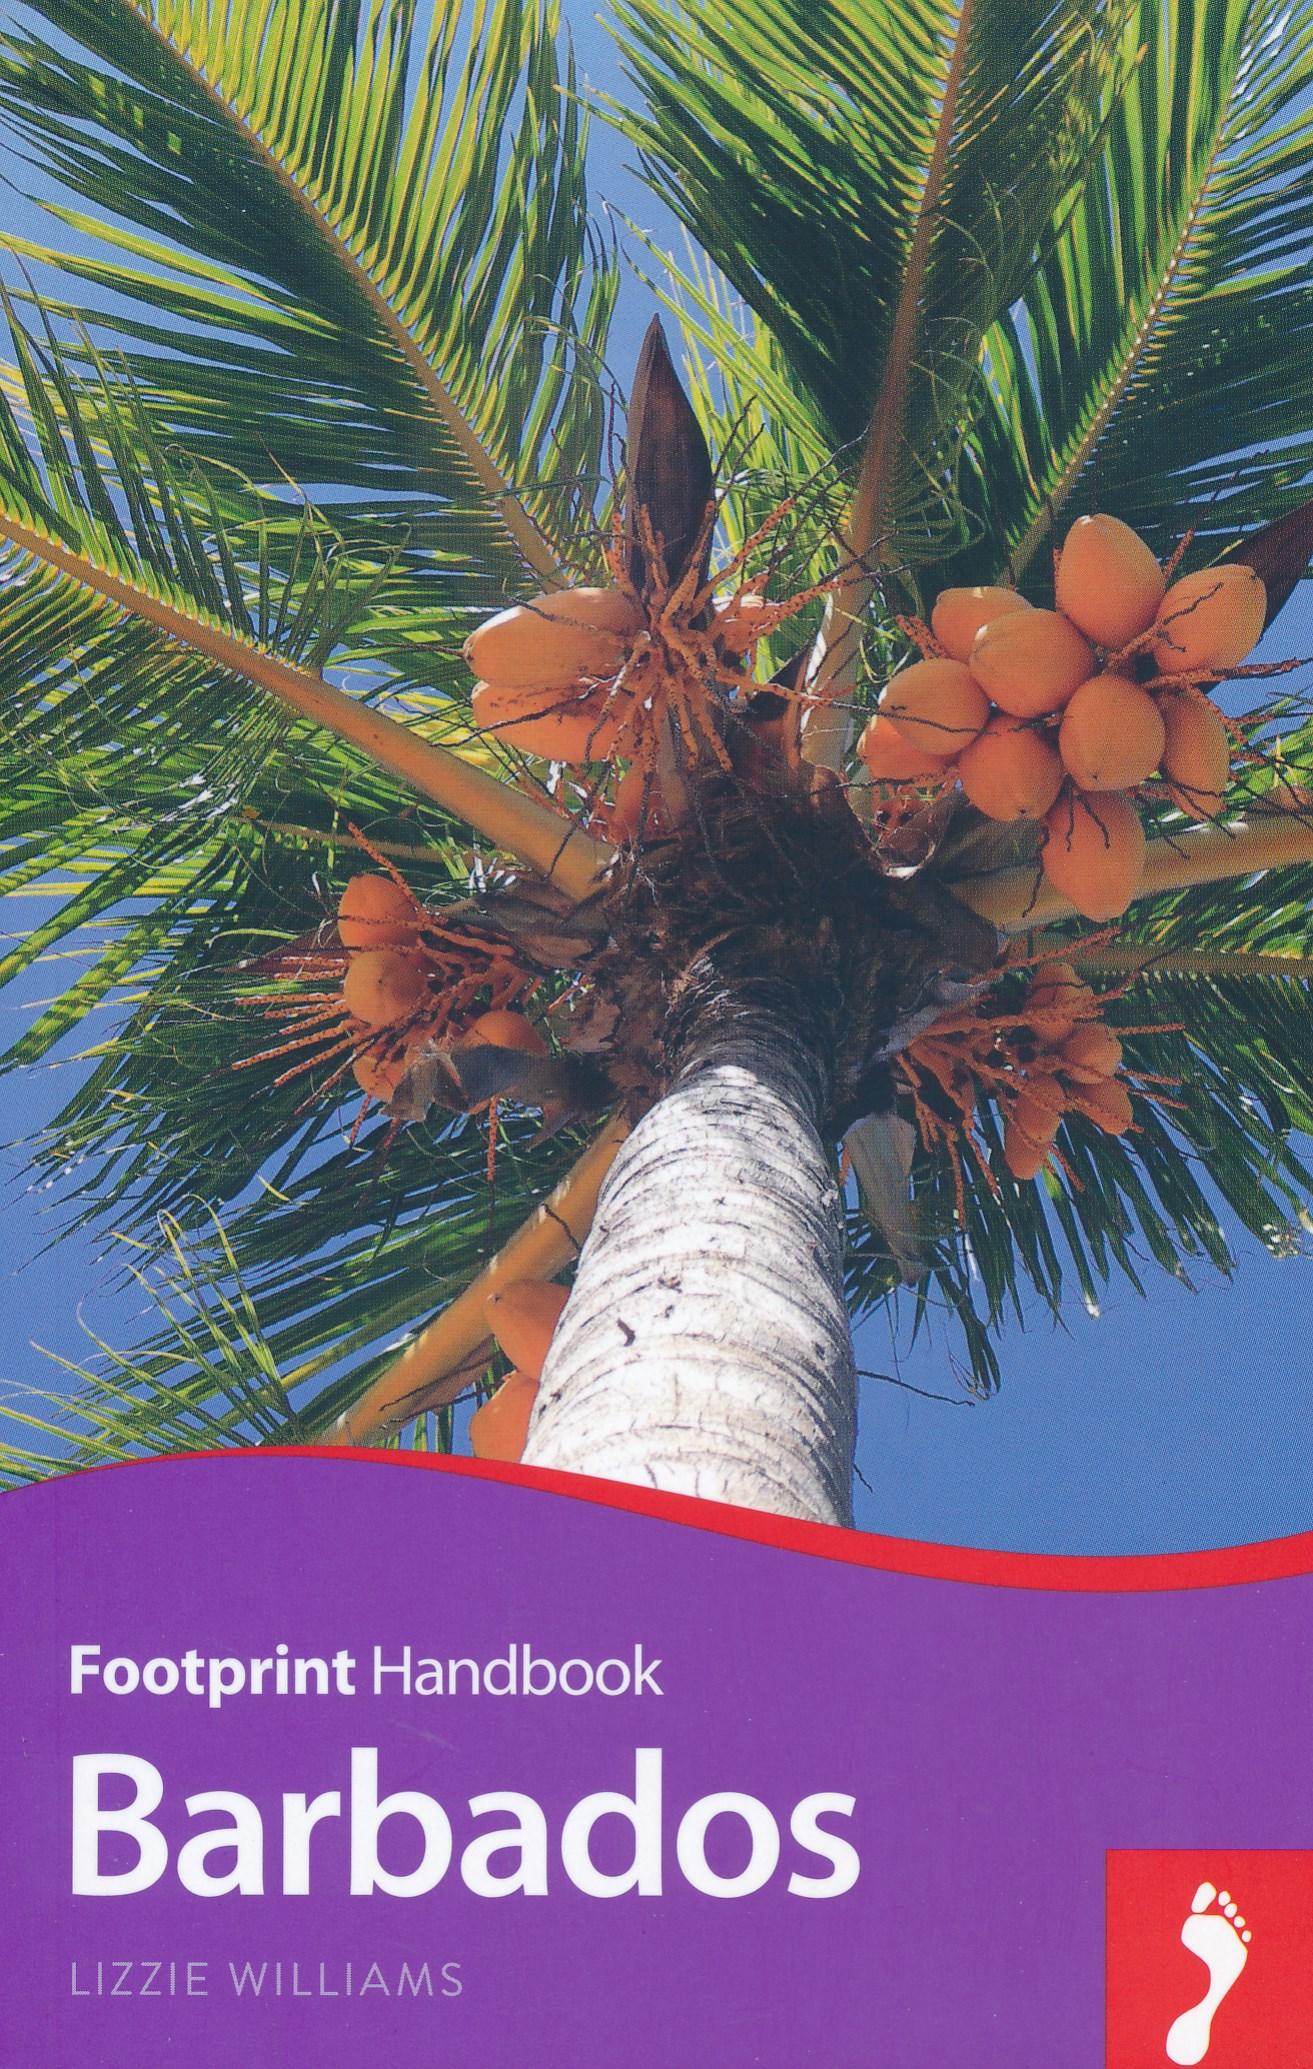 Online bestellen: Reisgids Handbook Barbados | Footprint